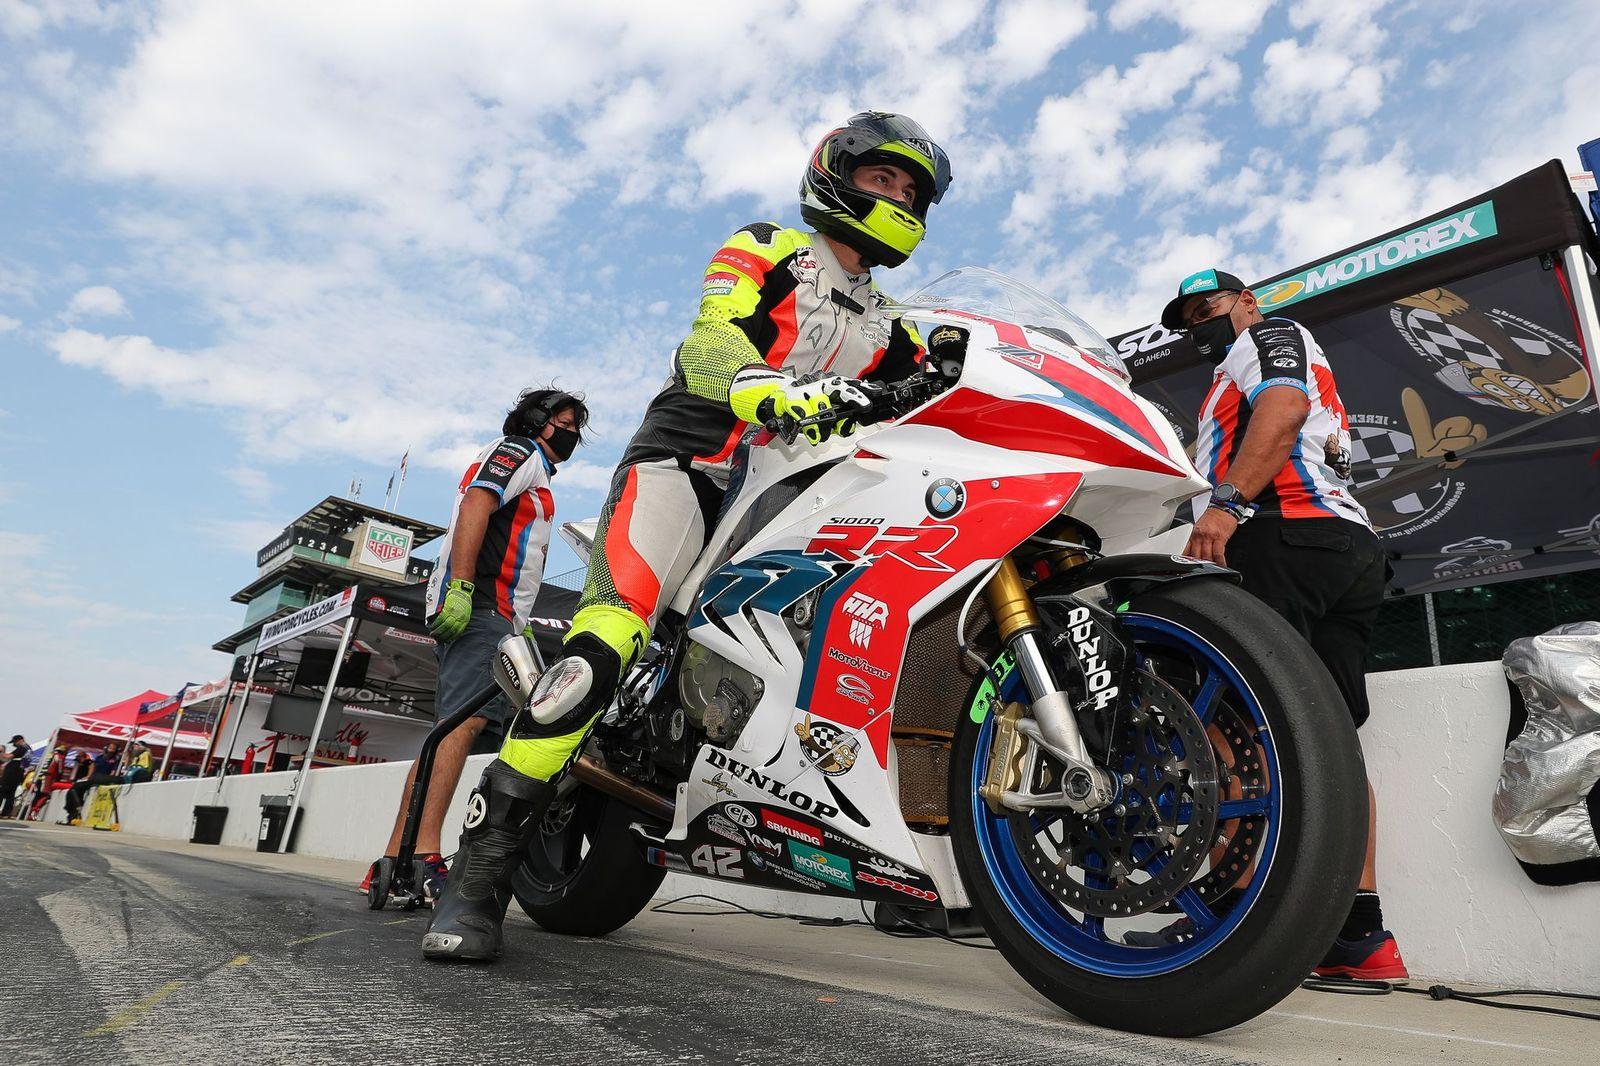 Motoamerica Indy Jeremy Coffey Speed Mon